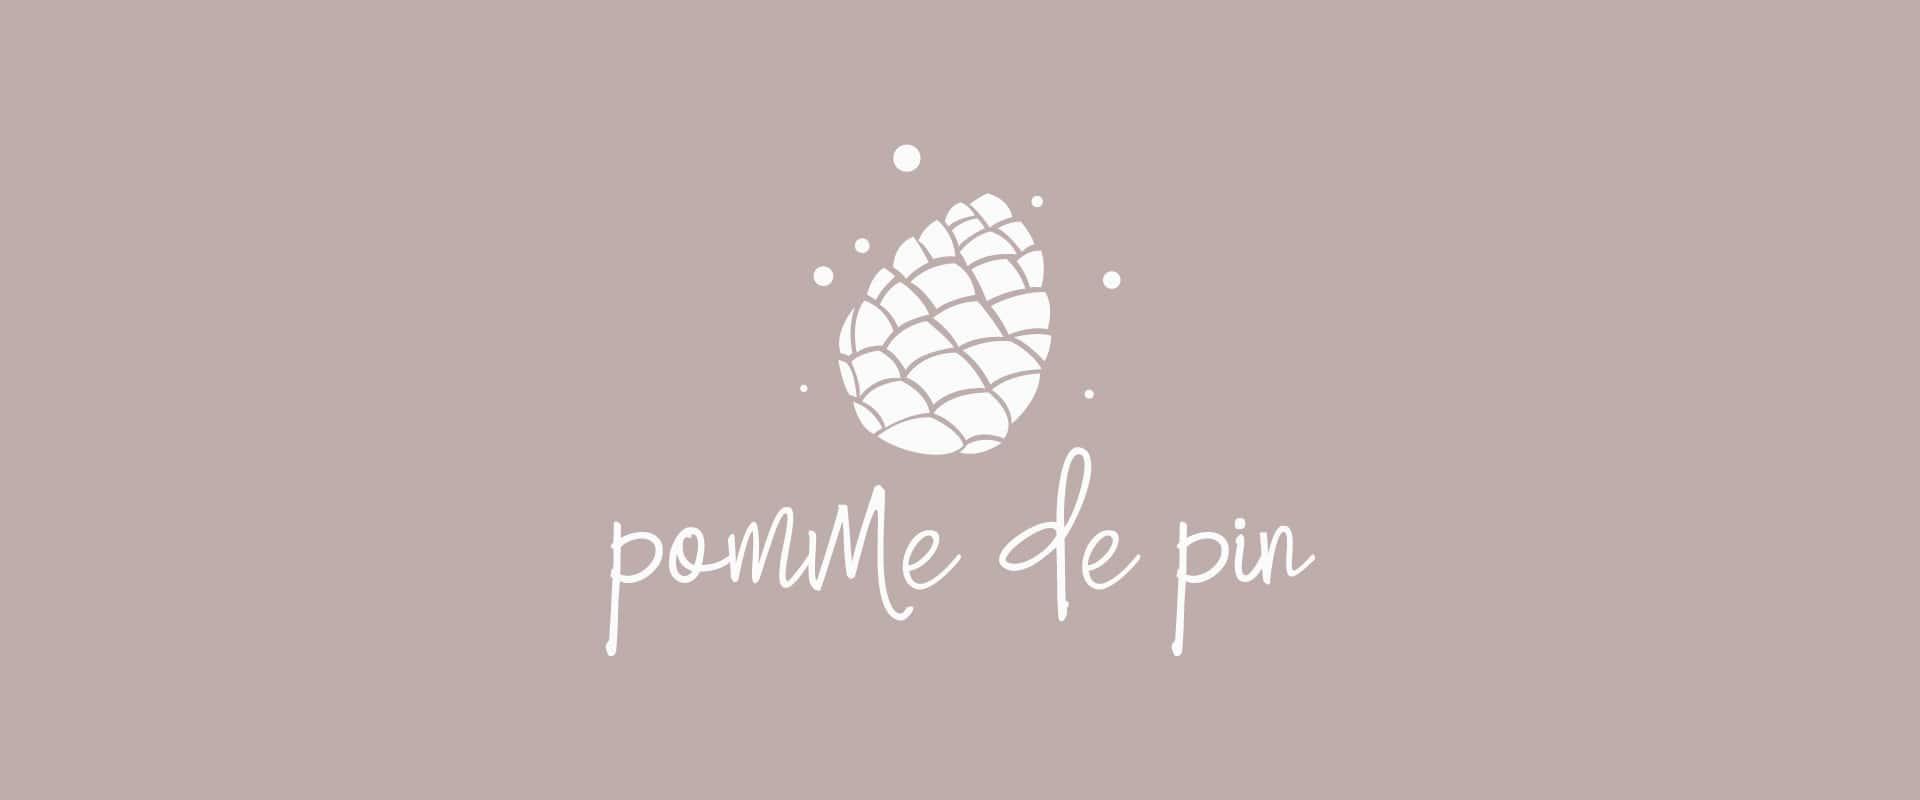 Pomme de pin logo